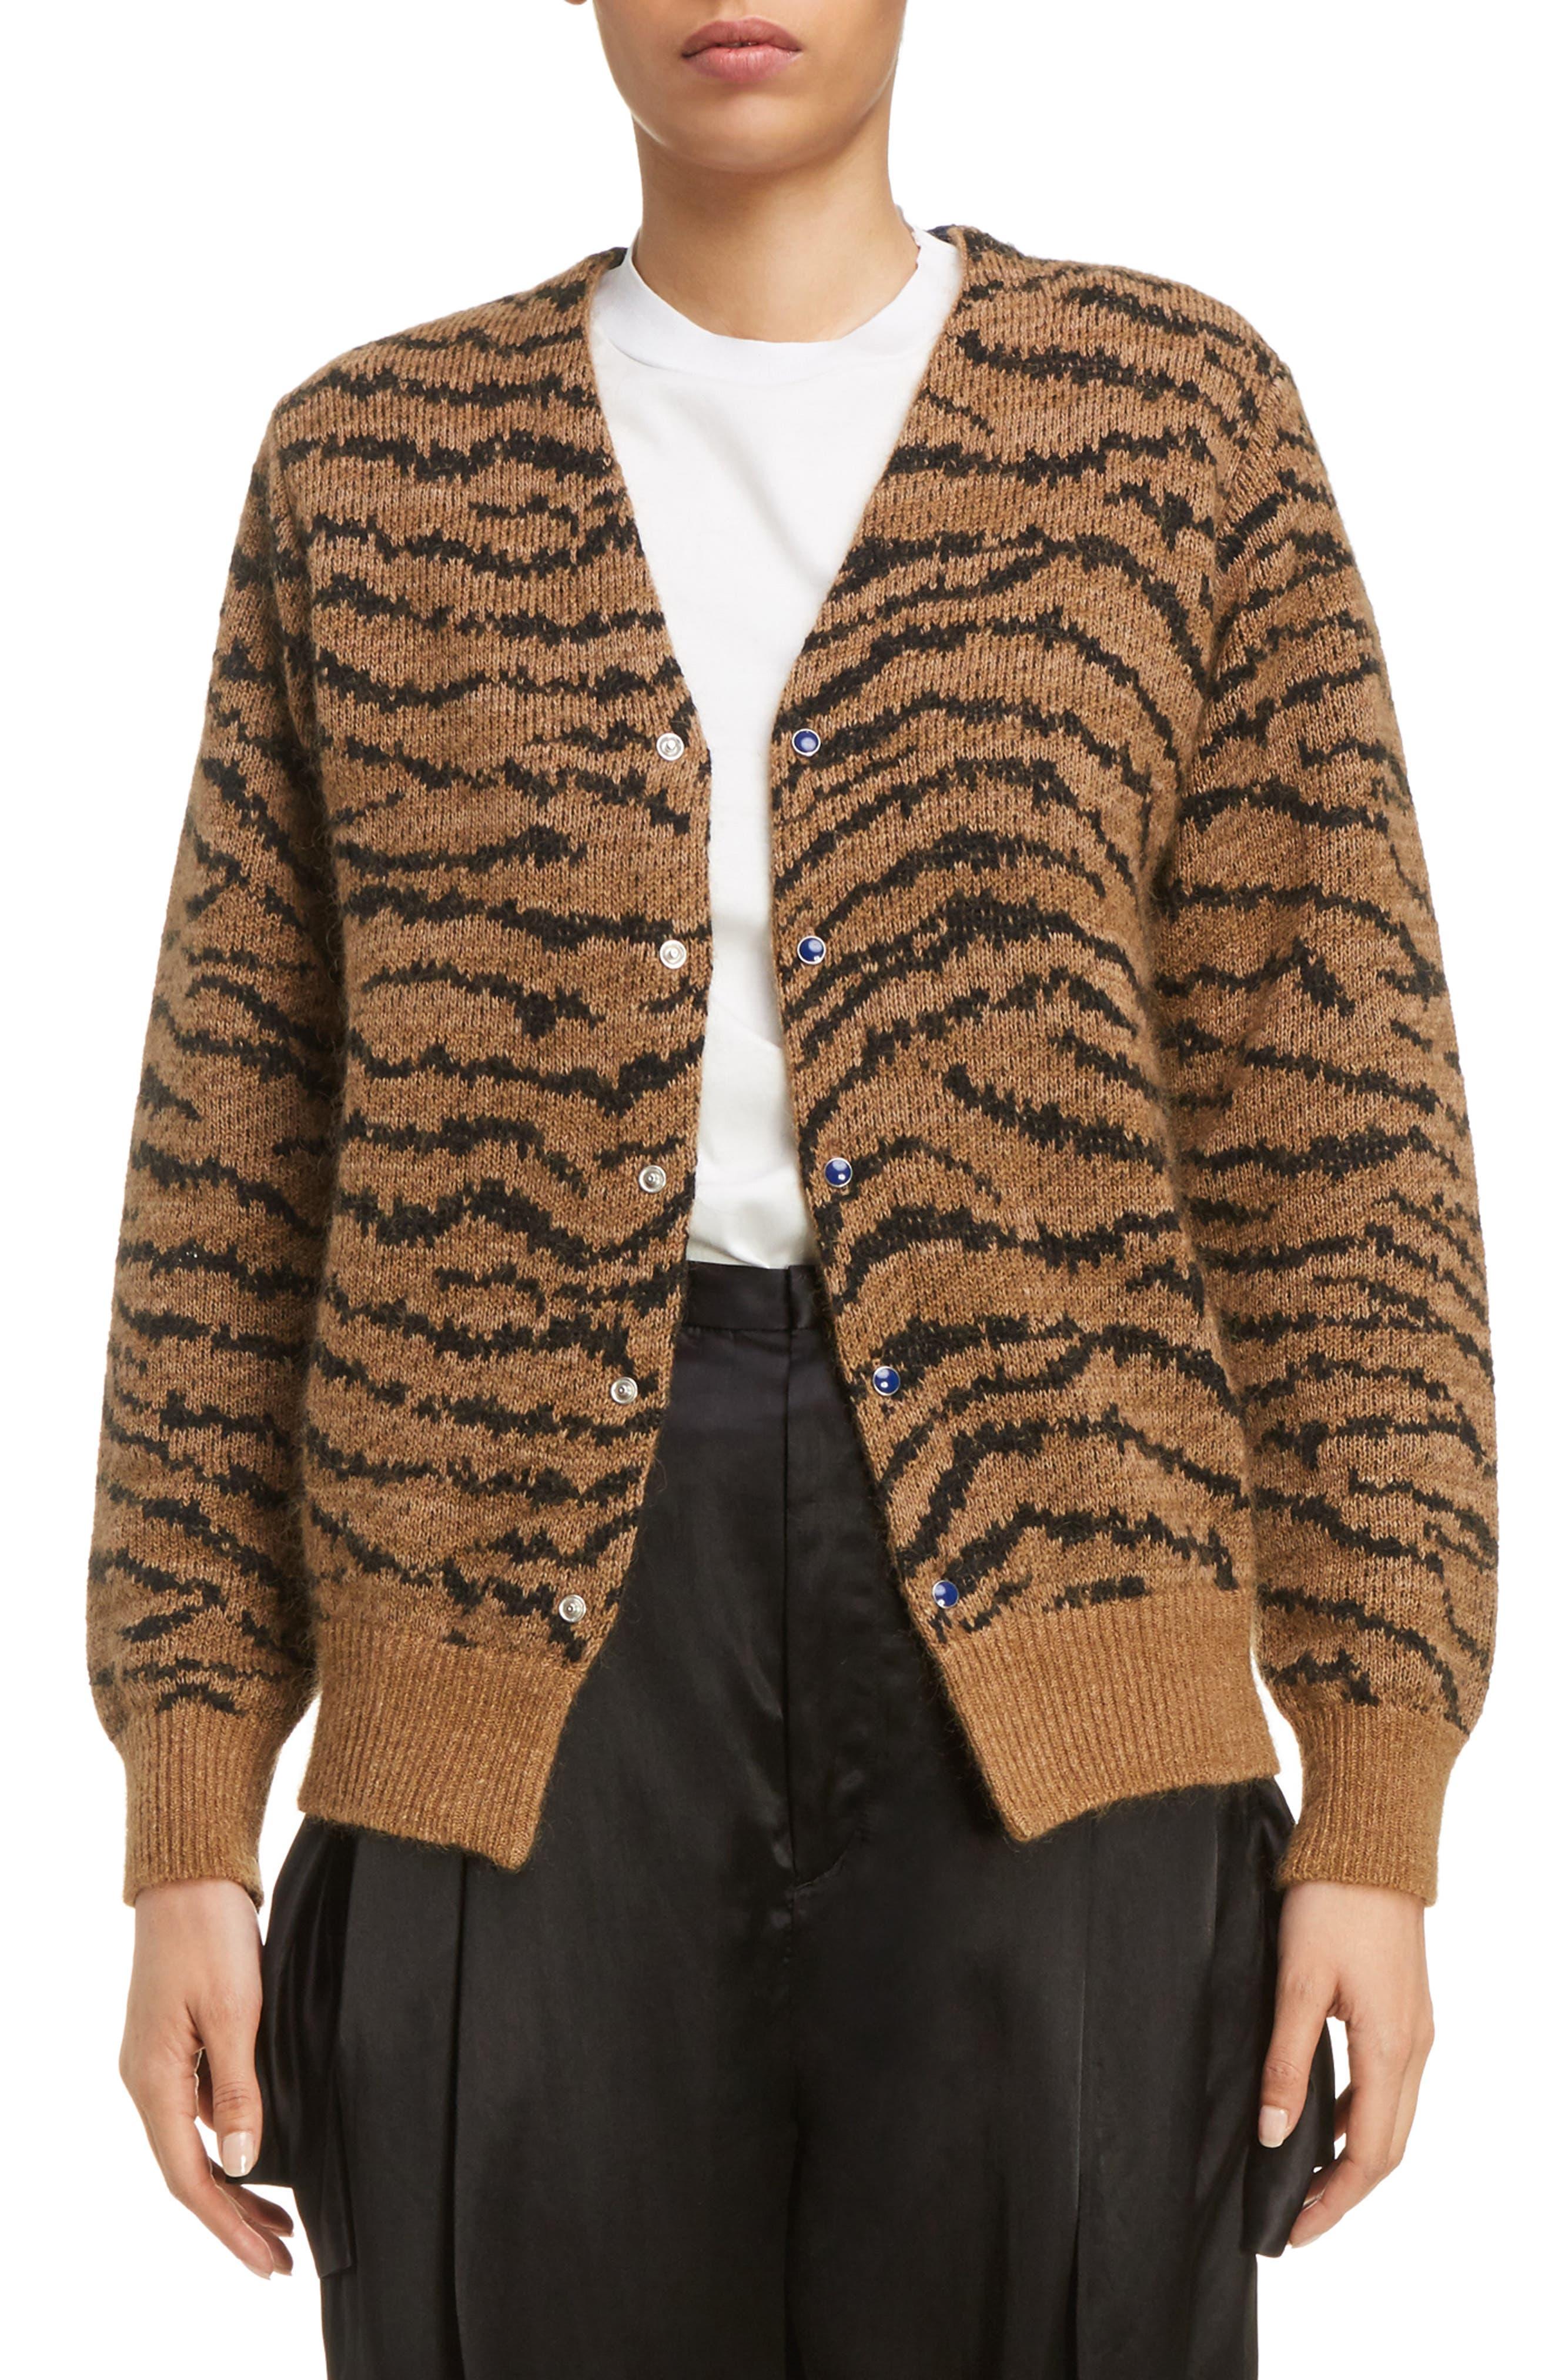 Tiger Jacquard Knit Button Cardigan,                             Main thumbnail 1, color,                             Beige